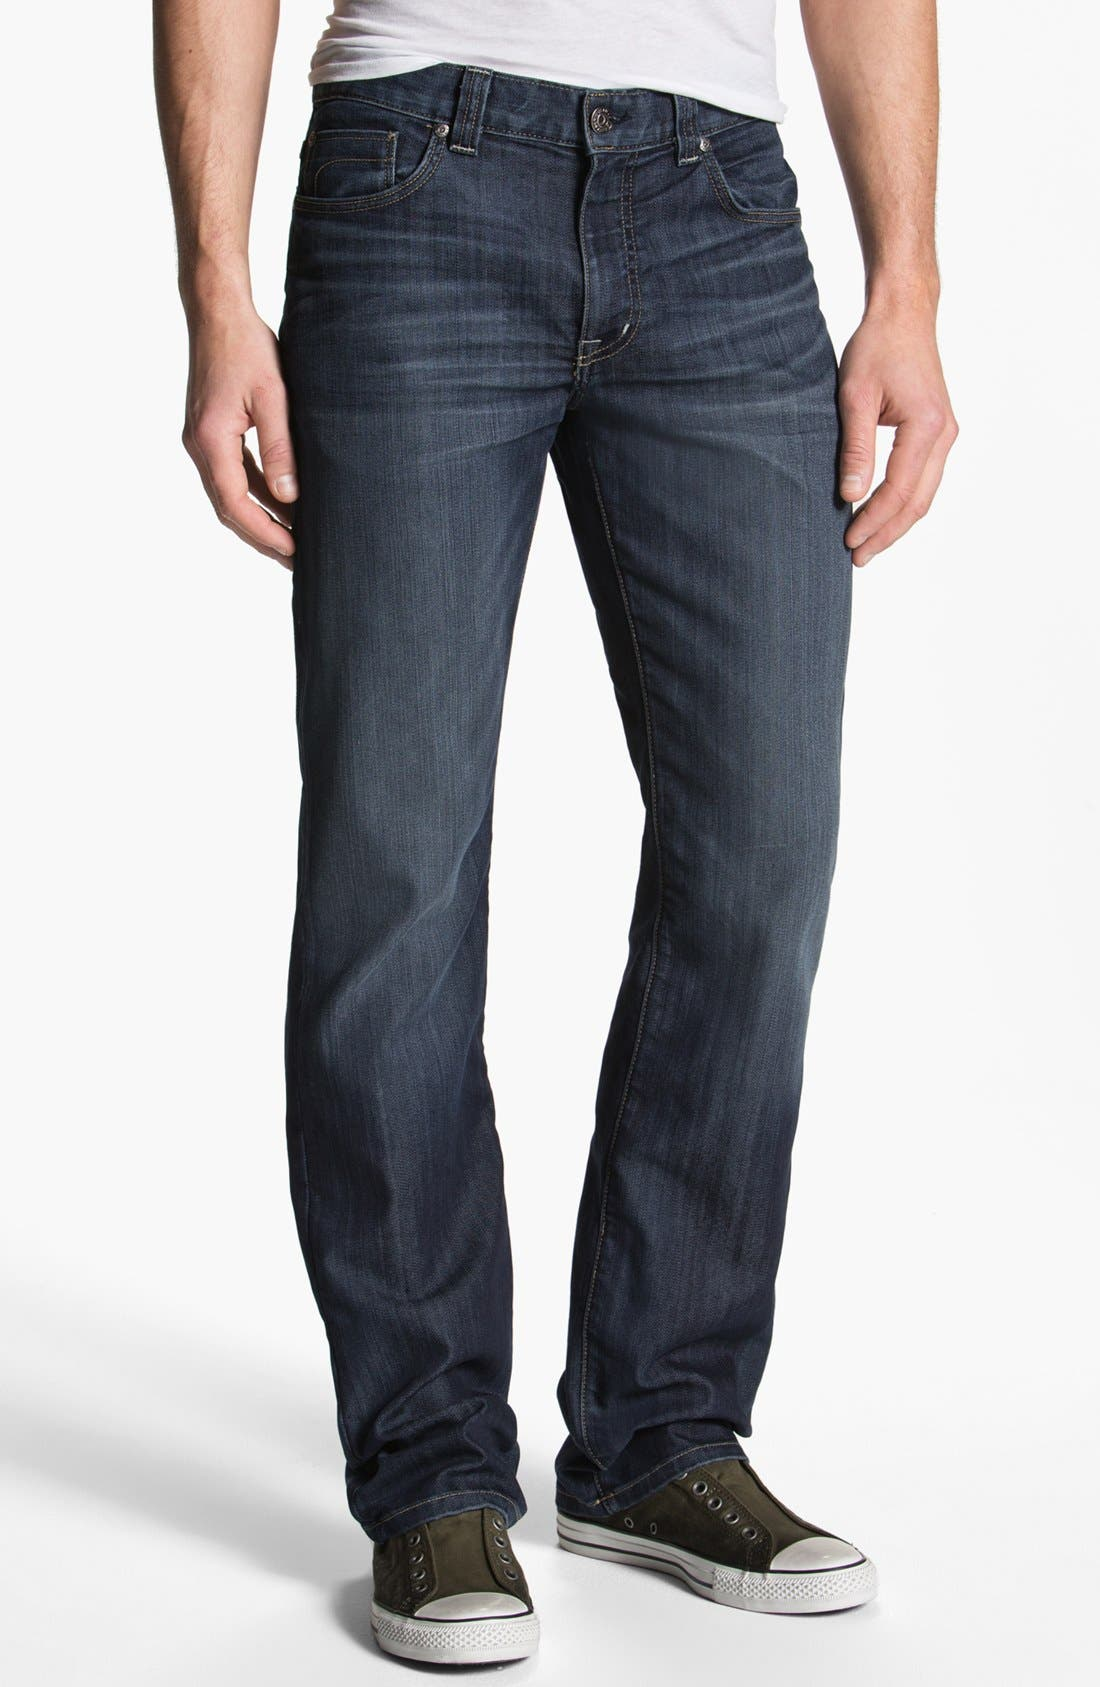 Alternate Image 1 Selected - Fidelity Denim '5011' Straight Leg Jeans (Petrol Blue)